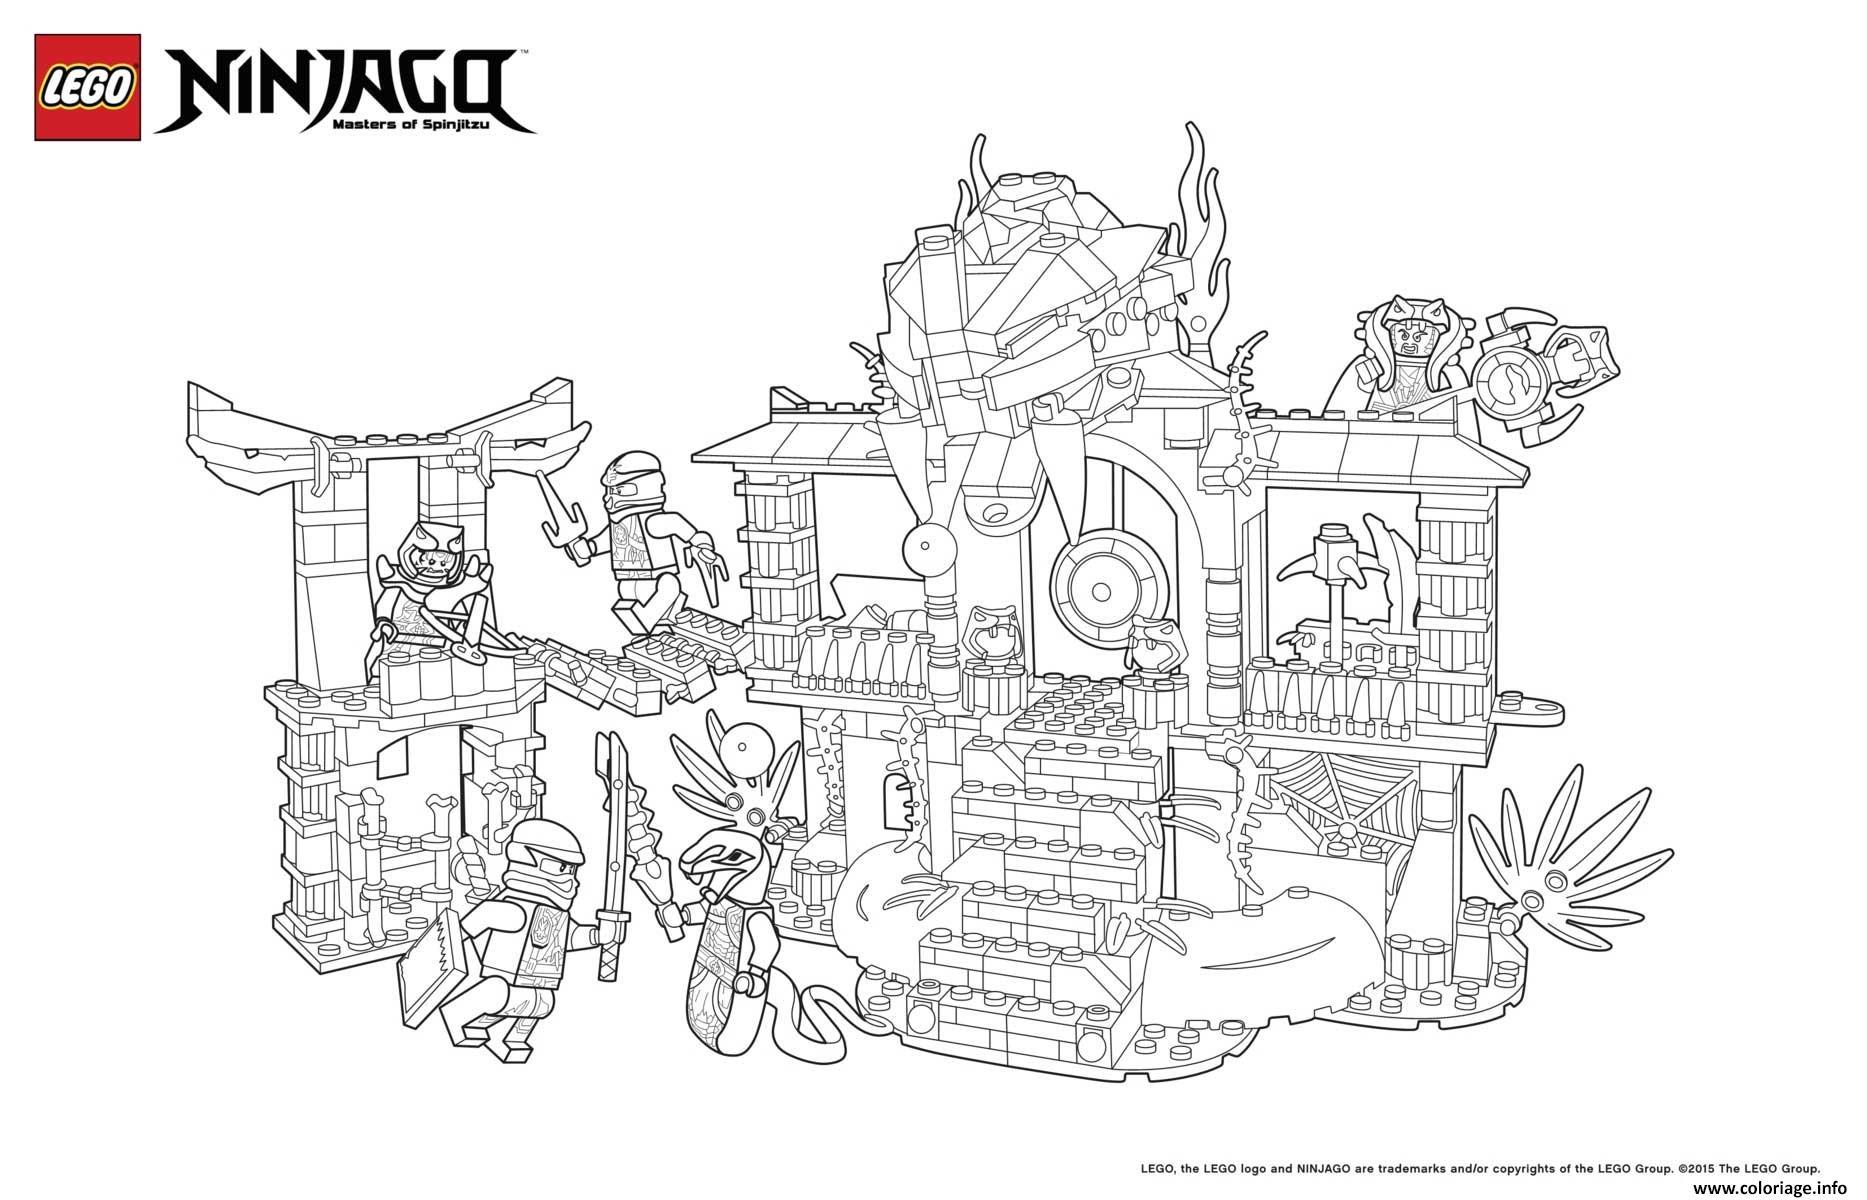 Coloriage le palais de ninjago lego dessin - Jeux de ninjago gratuit lego ...